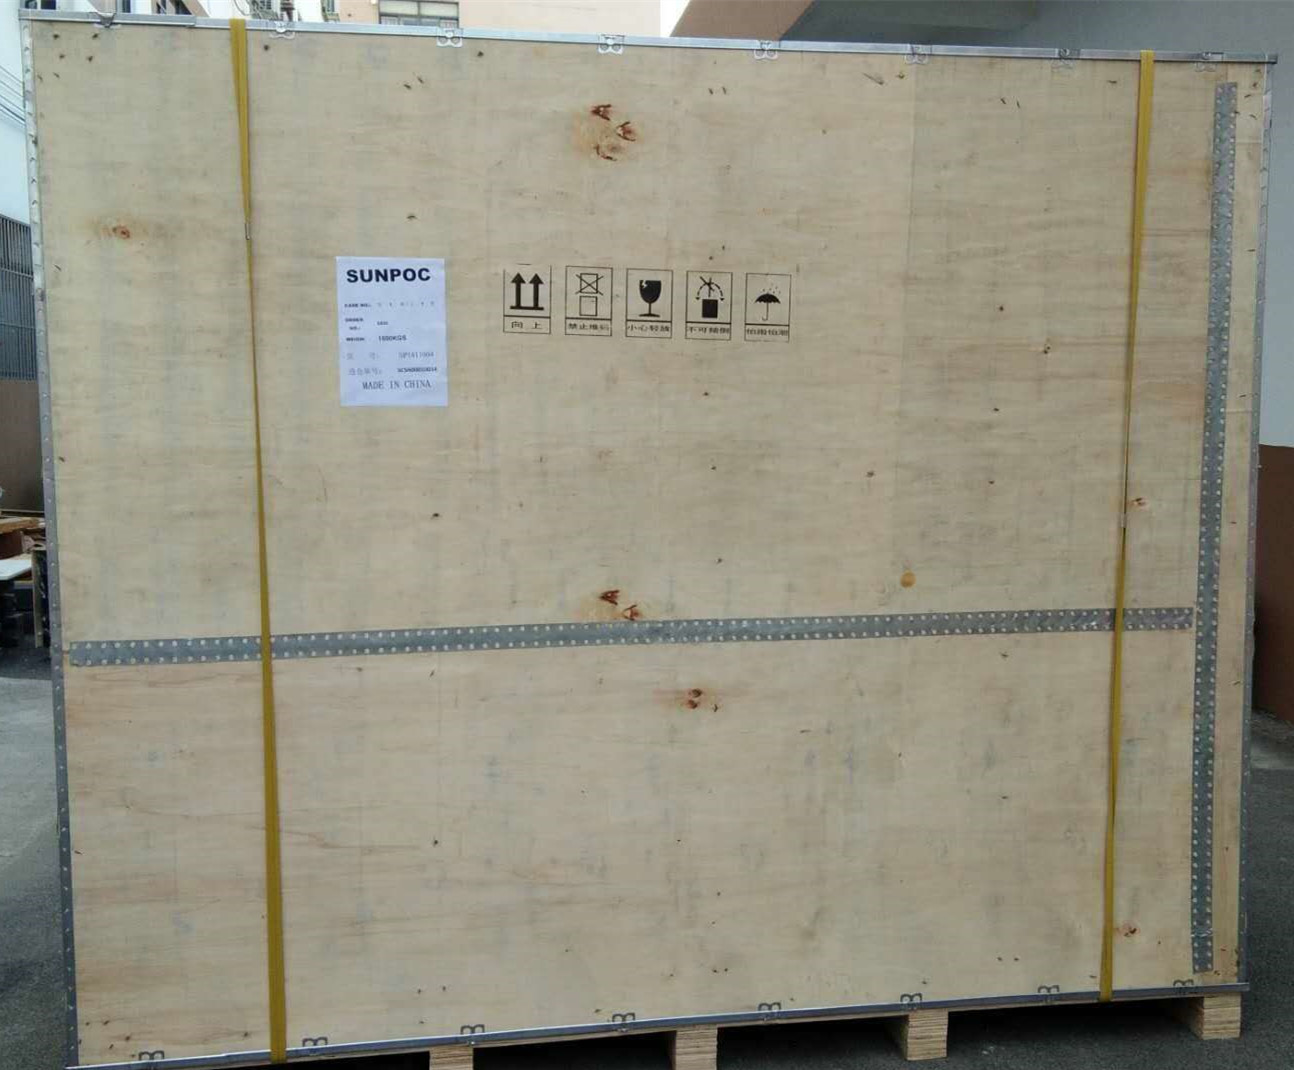 SOBEKK S series Semi-Automatic Video Measuring Machine